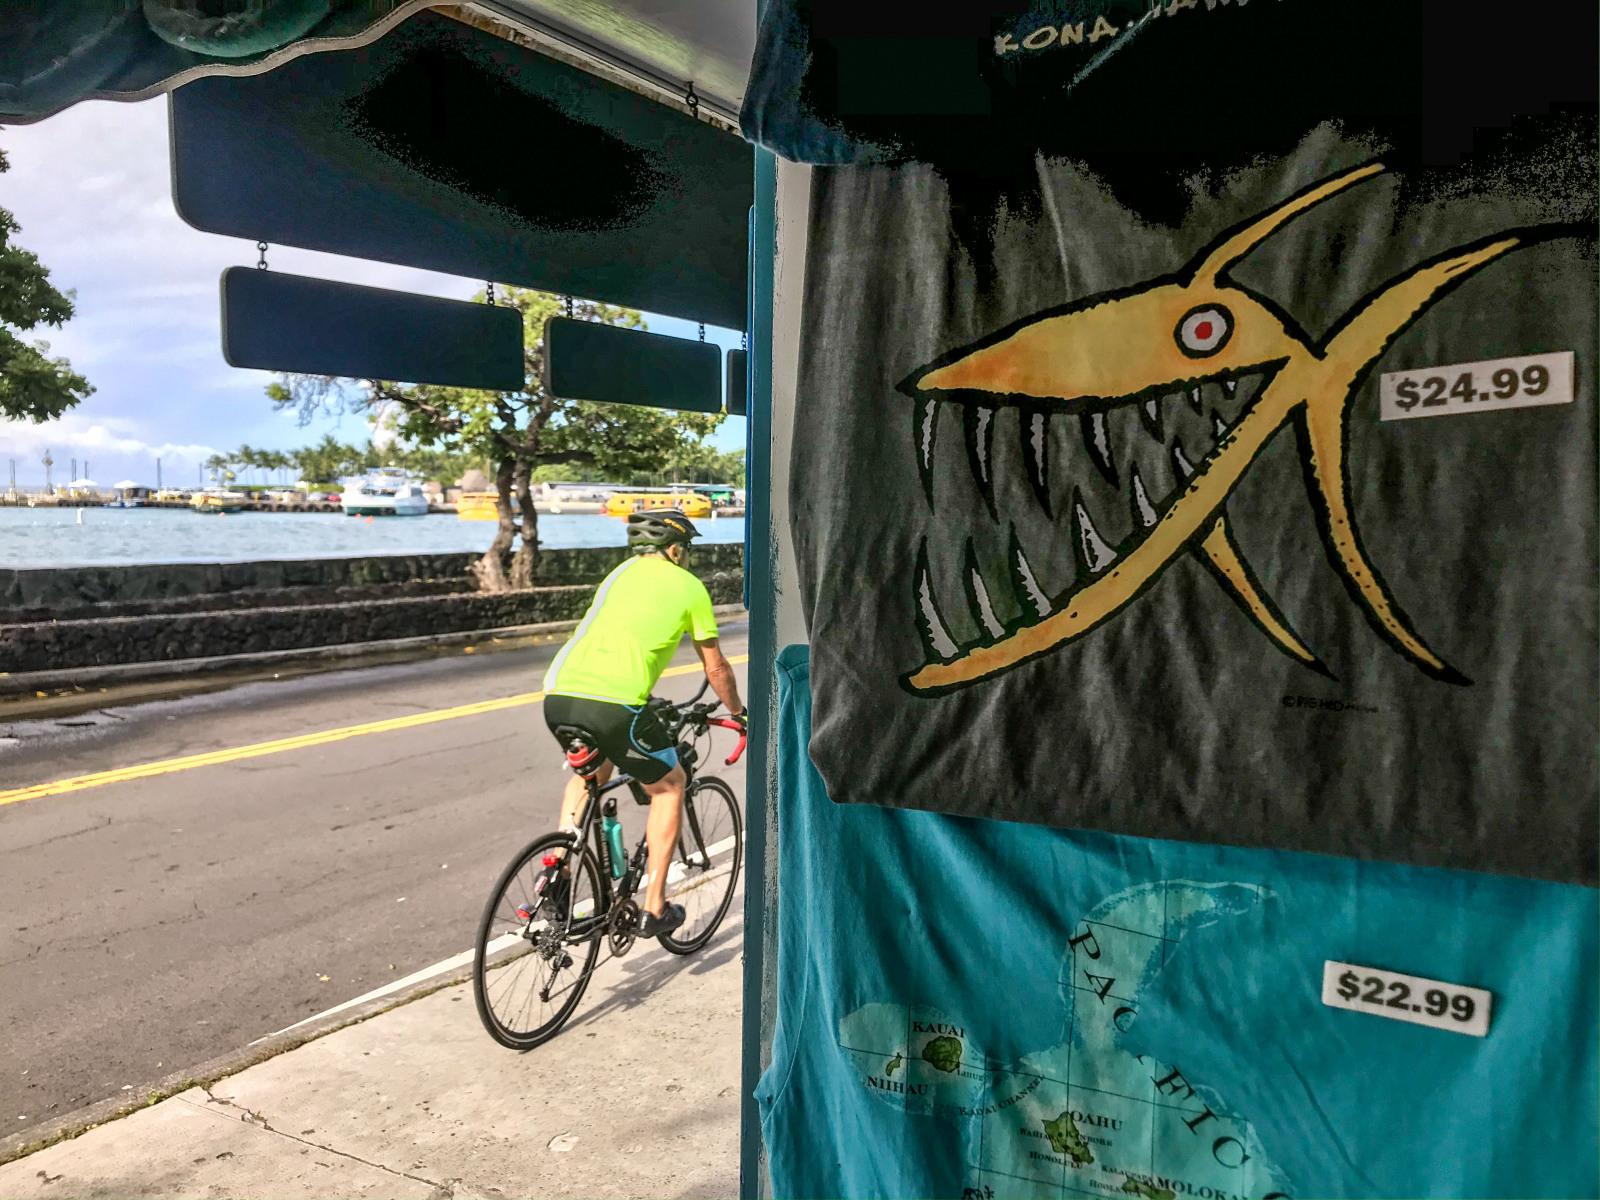 Kailua-Kona und die Ruhe vor dem Sturm